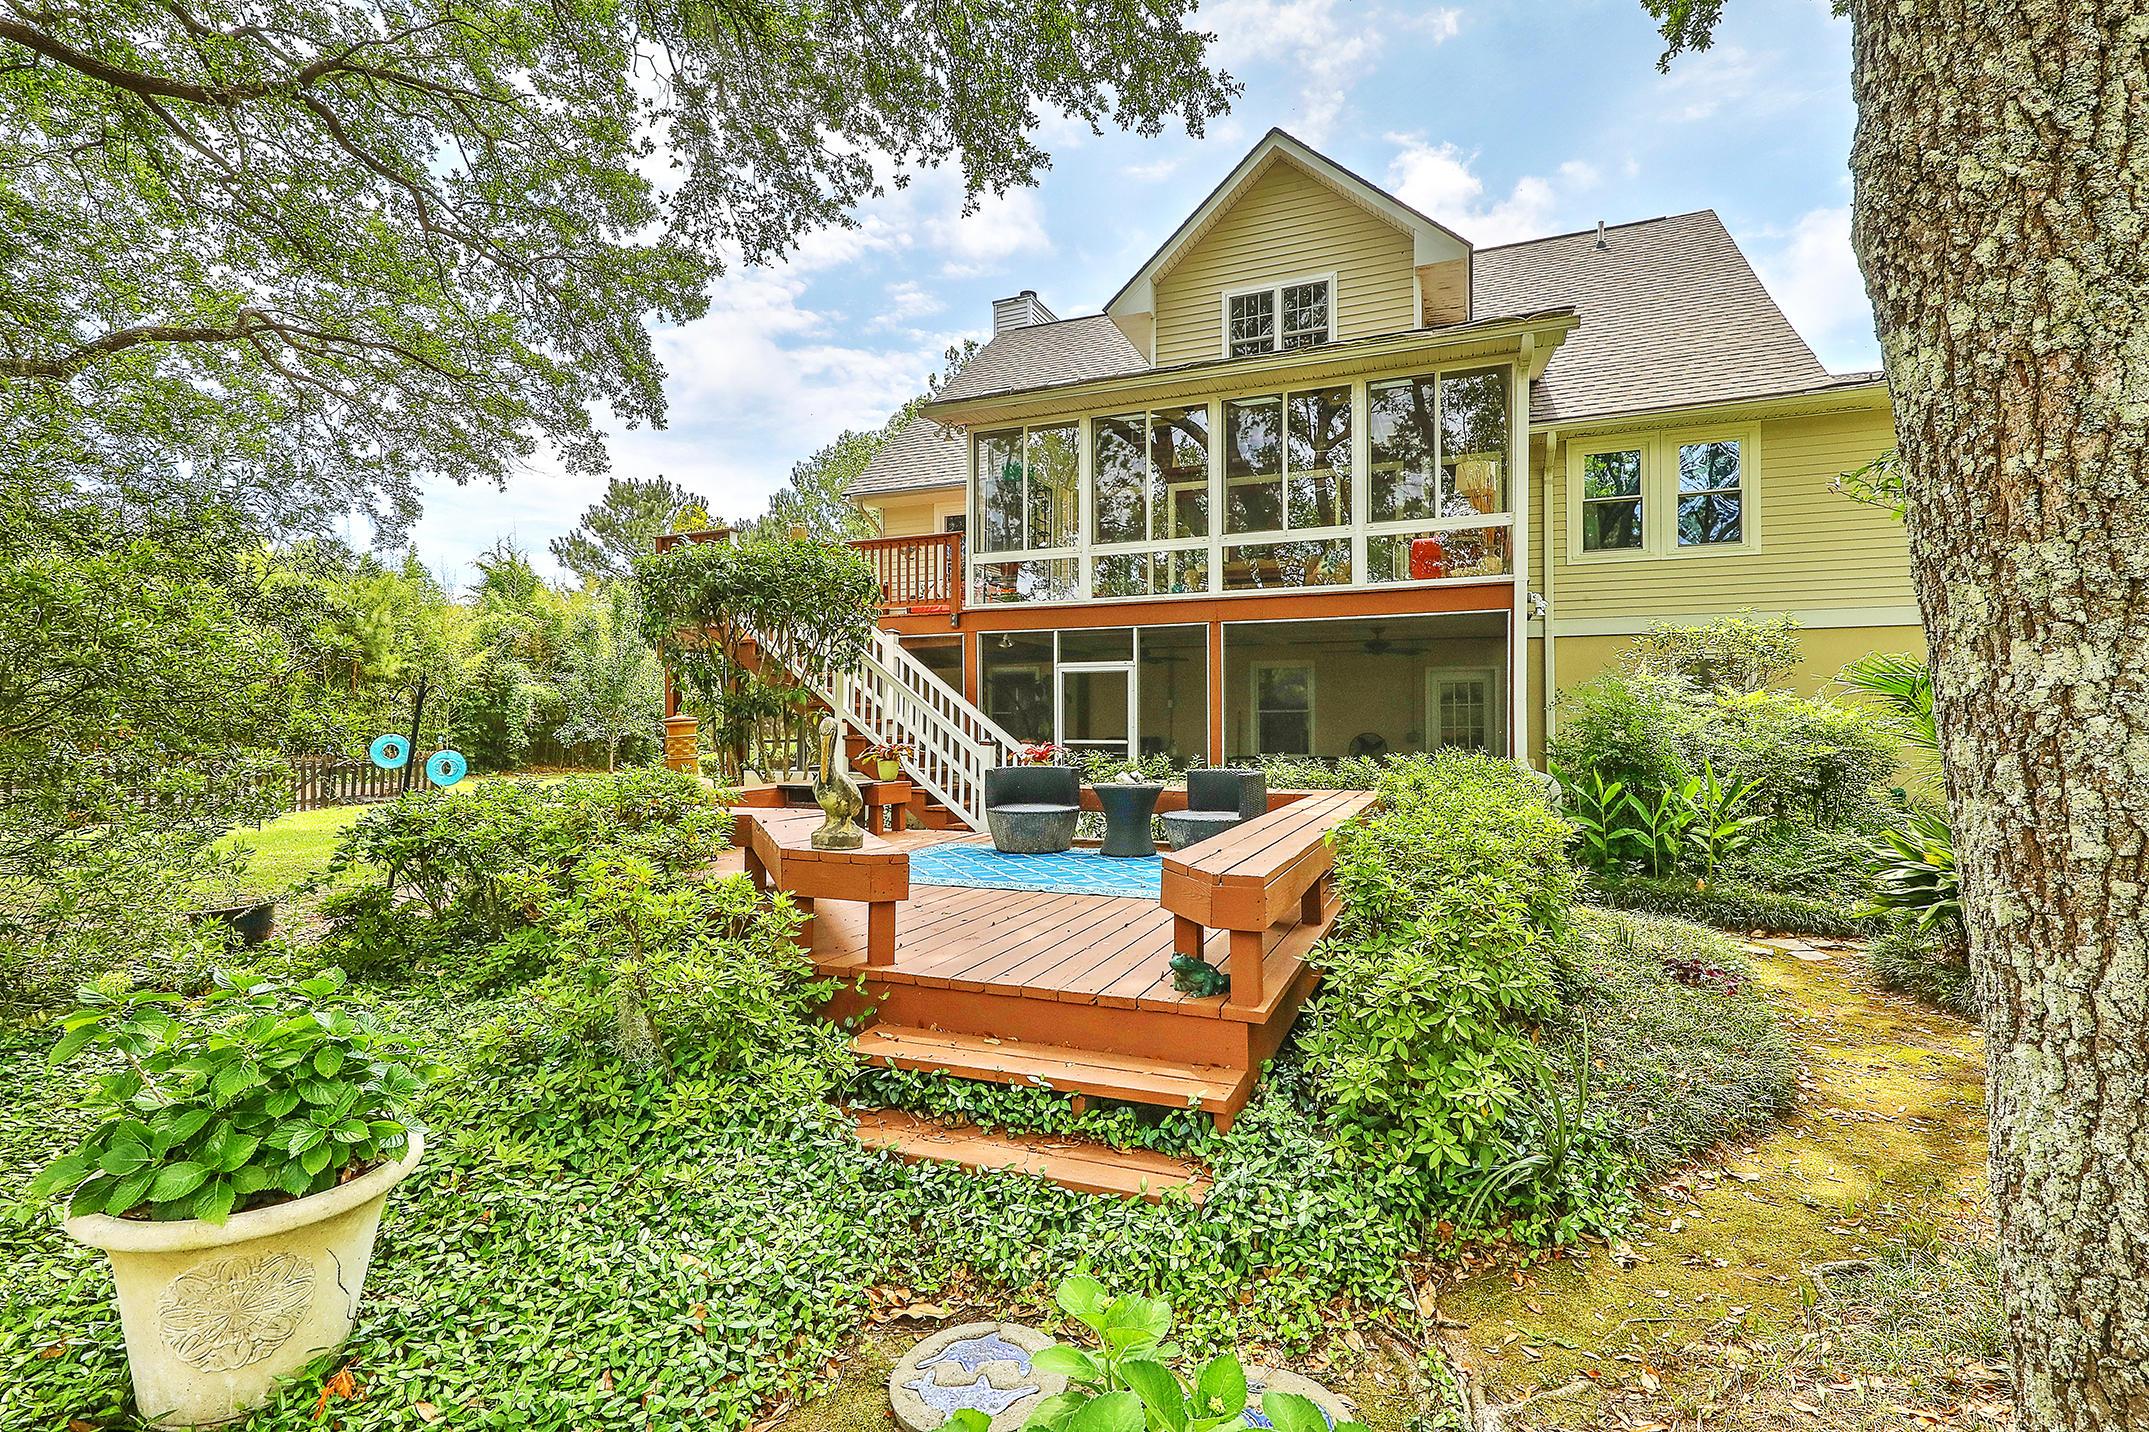 Stono Pointe Homes For Sale - 2660 Burden Creek, Johns Island, SC - 19